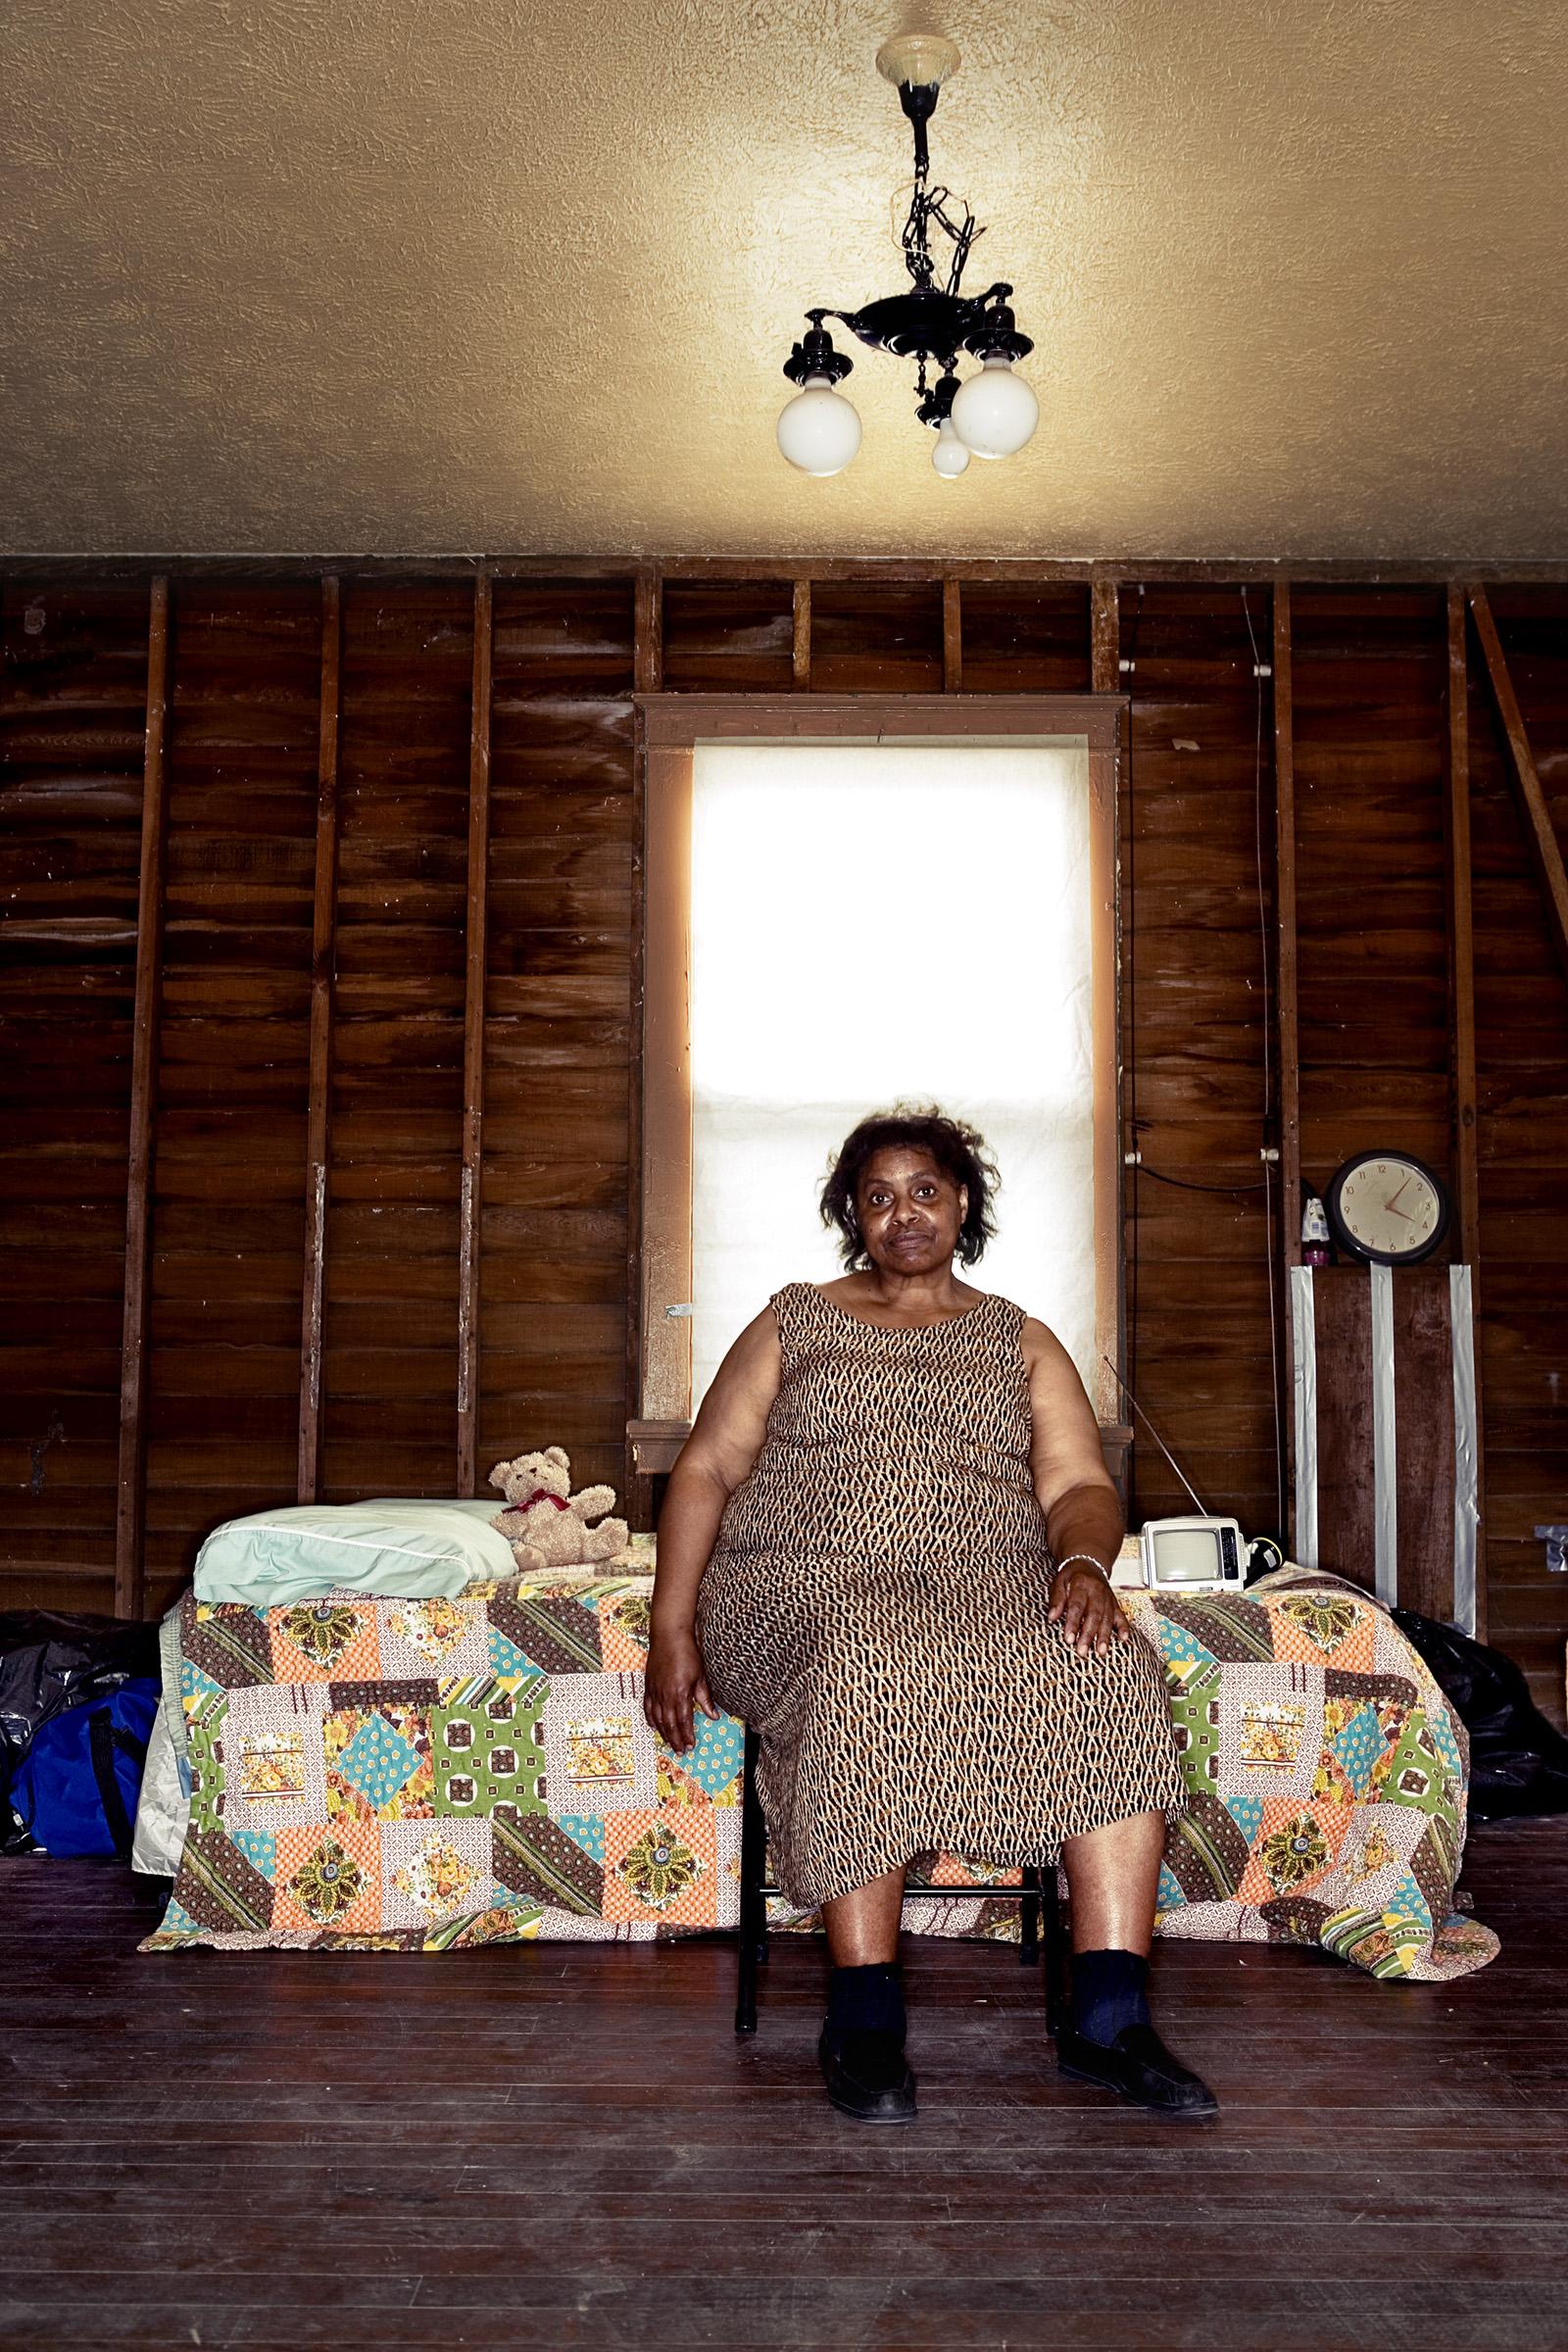 Post Hurricane Katrina: Carolyn on bed© Stephen Wilkes